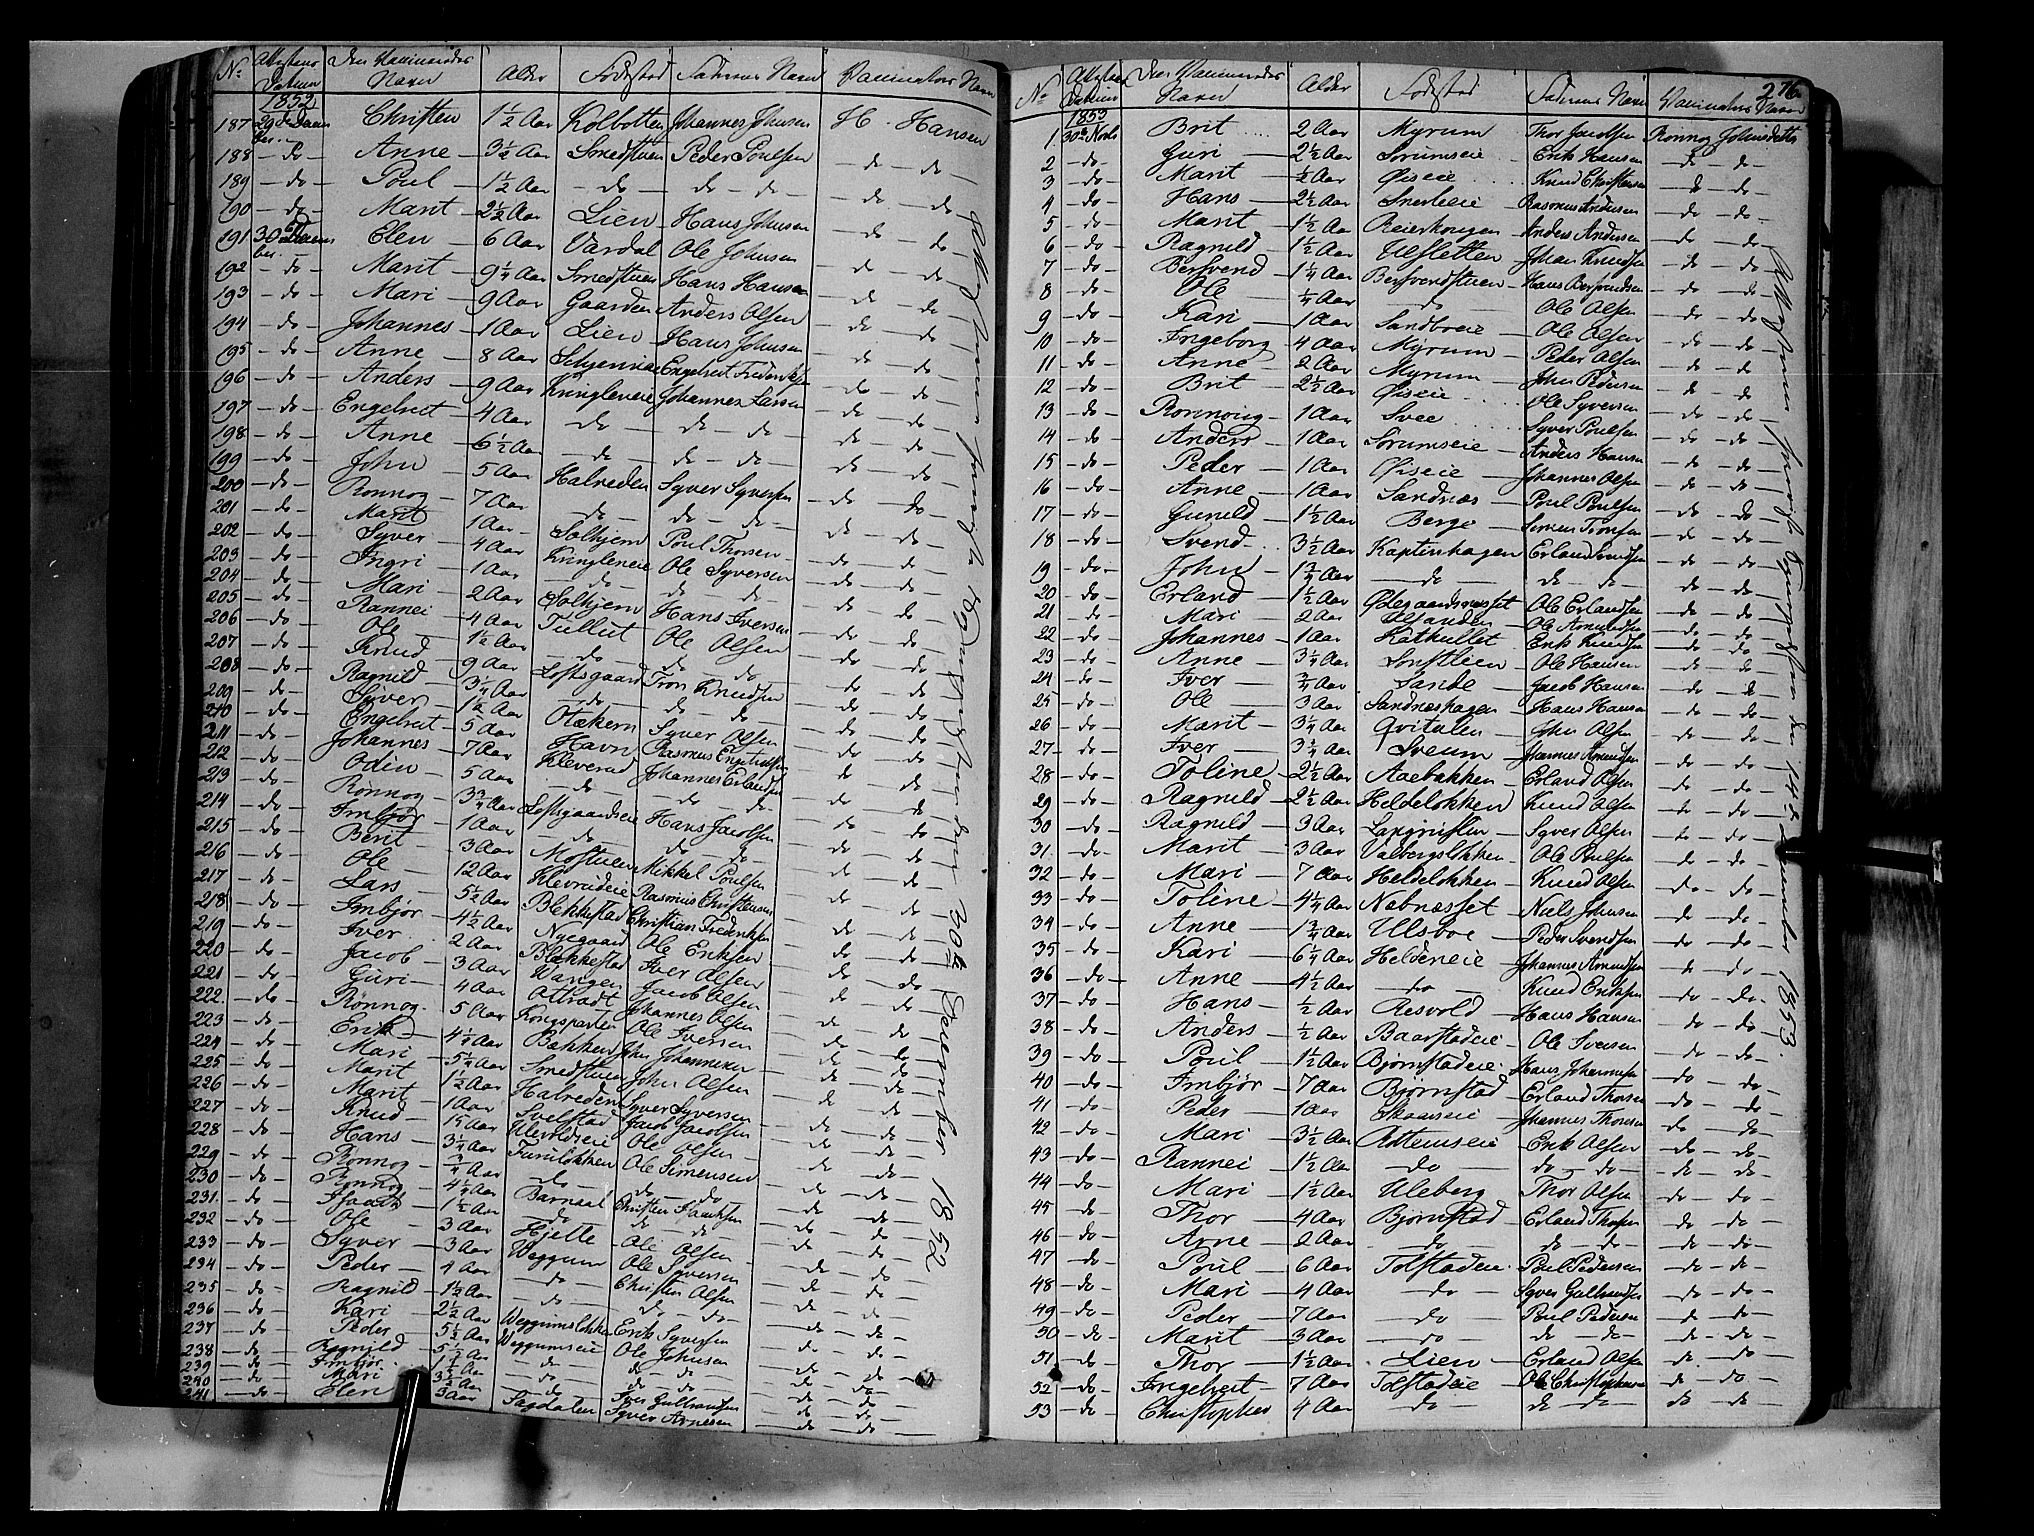 SAH, Vågå prestekontor, Ministerialbok nr. 5 /1, 1842-1856, s. 276